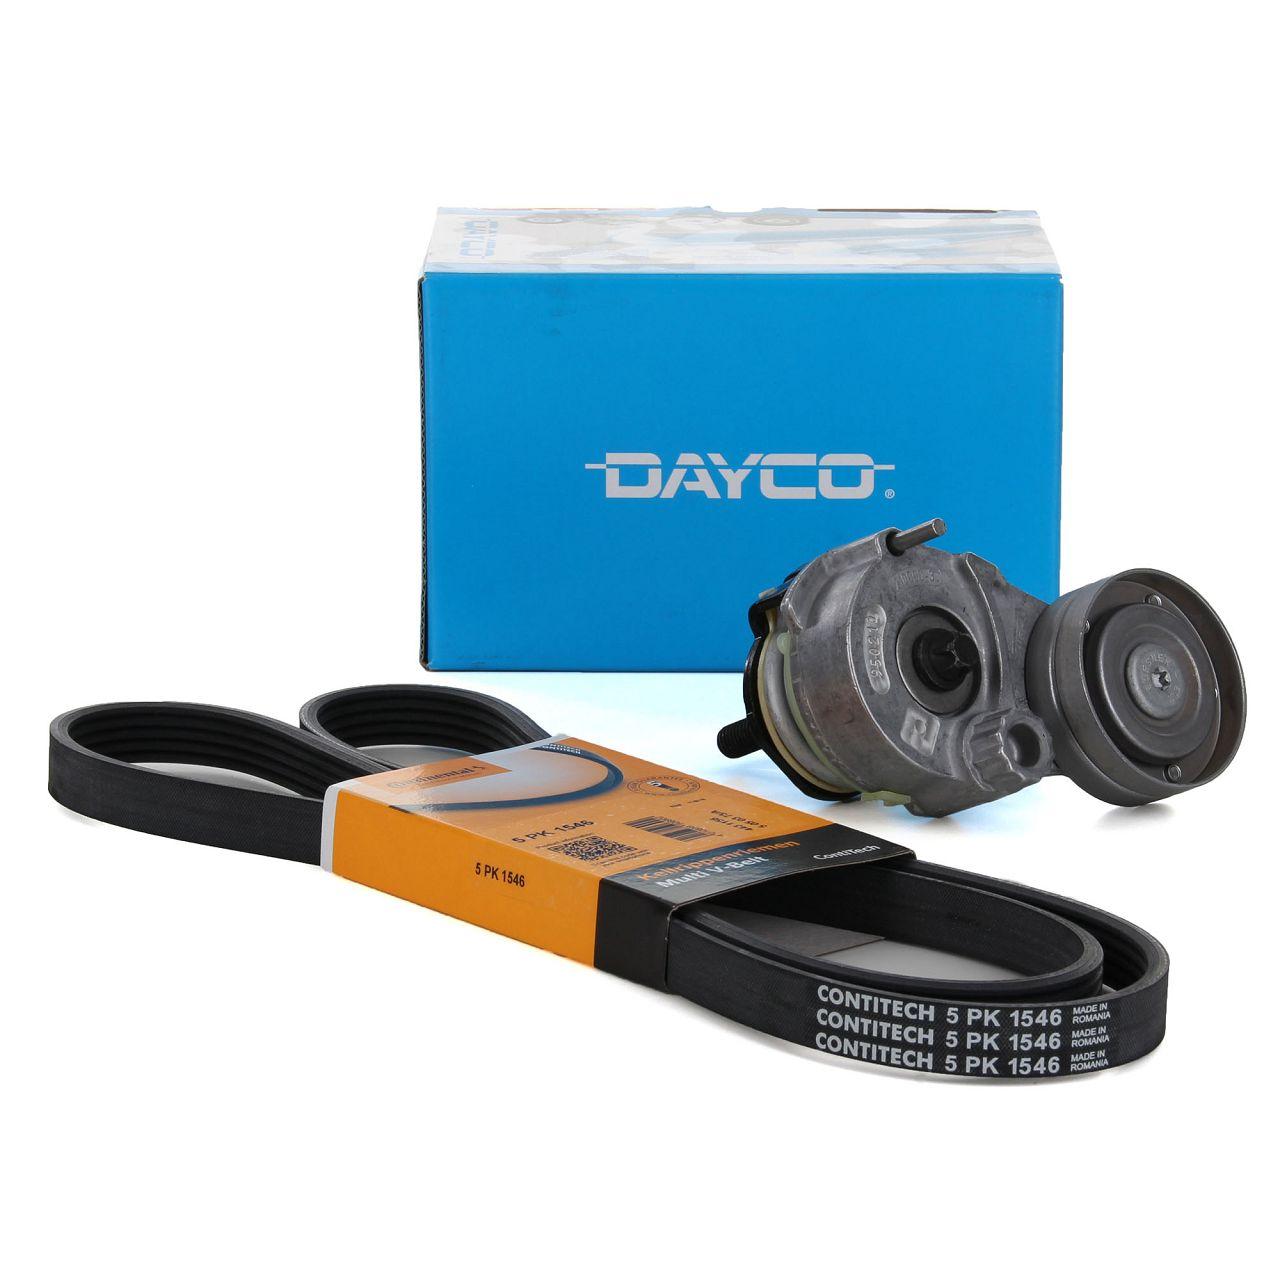 DAYCO 5PK1545 Keilrippenriemen + DAYCO Riemenspanner ALFA ROMEO FIAT OPEL 1.6 1.8